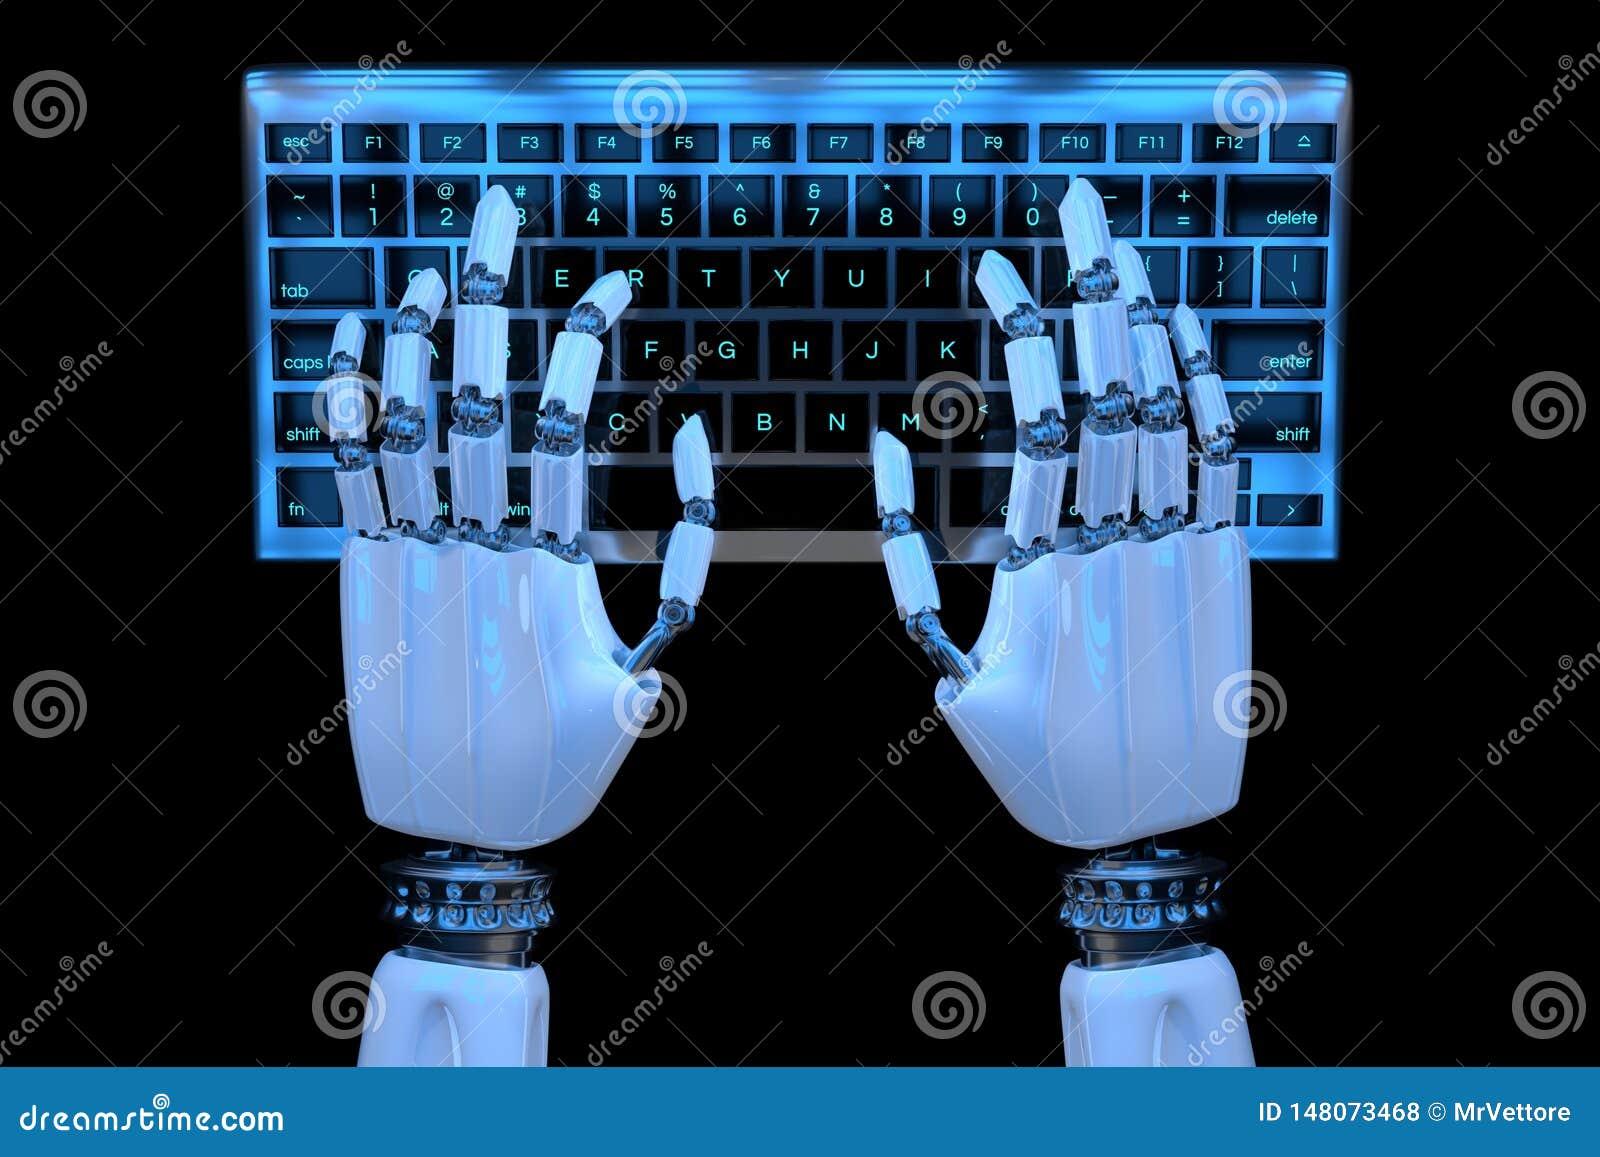 3d Robot-händer som skriver på tangentbord, tangentbord Robotisk hand cyborg med dator 3d ge en realistisk bild